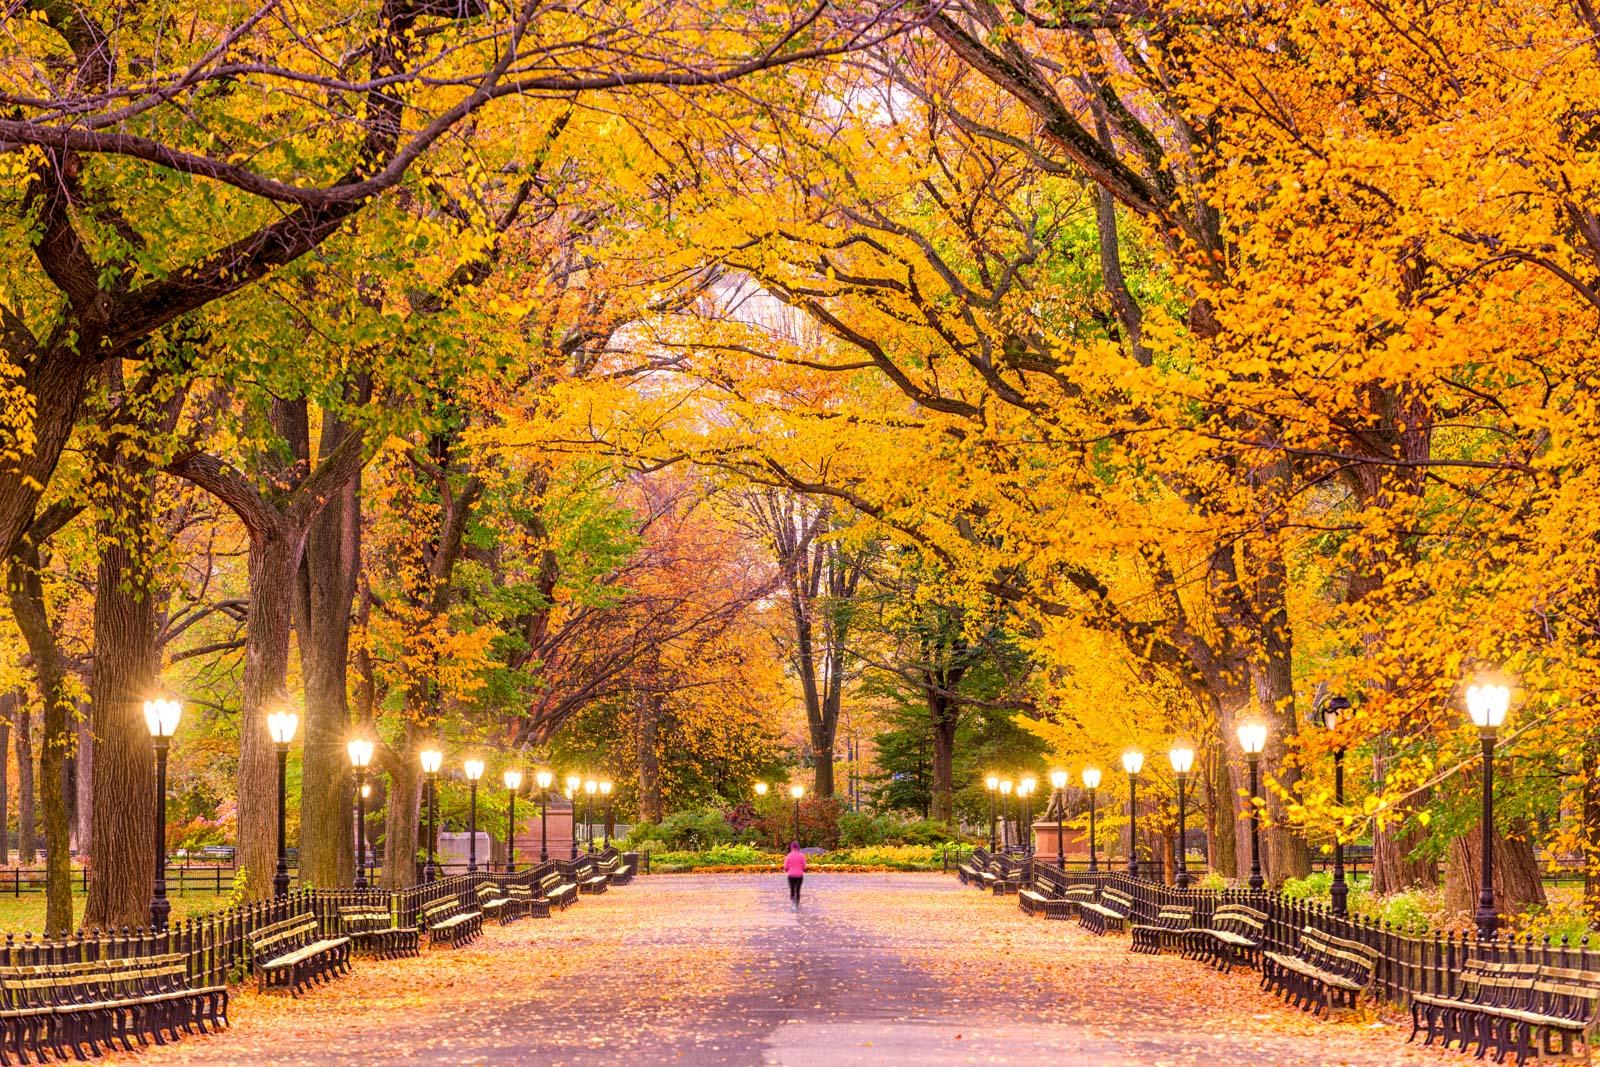 Central Park Mall, New York City, New York.